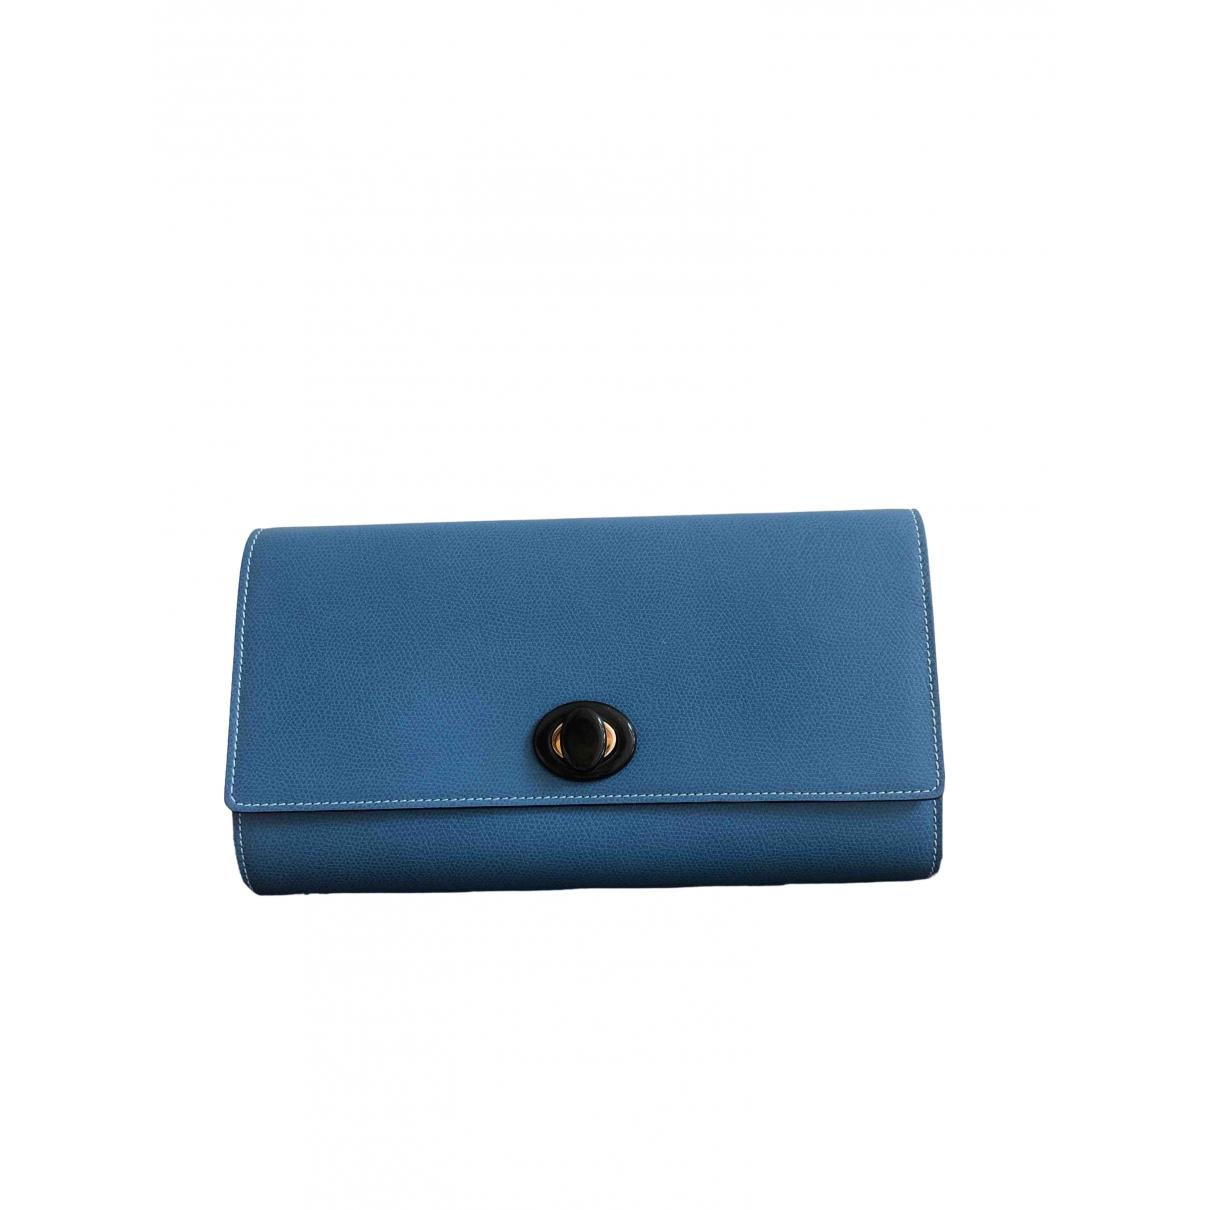 Valextra \N Clutch in  Blau Leder